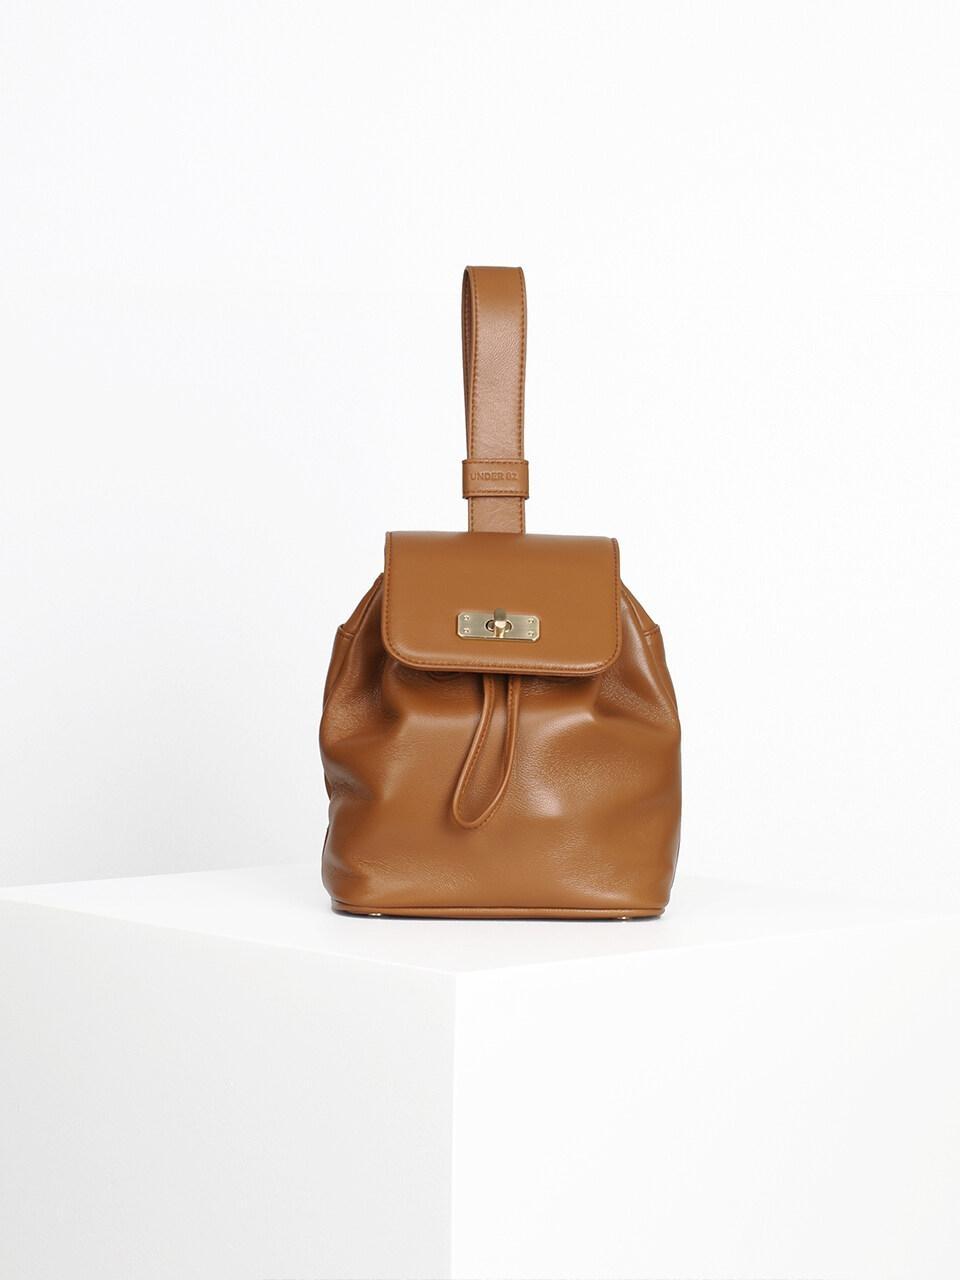 「UNDER82 Kangroo bag」の画像検索結果